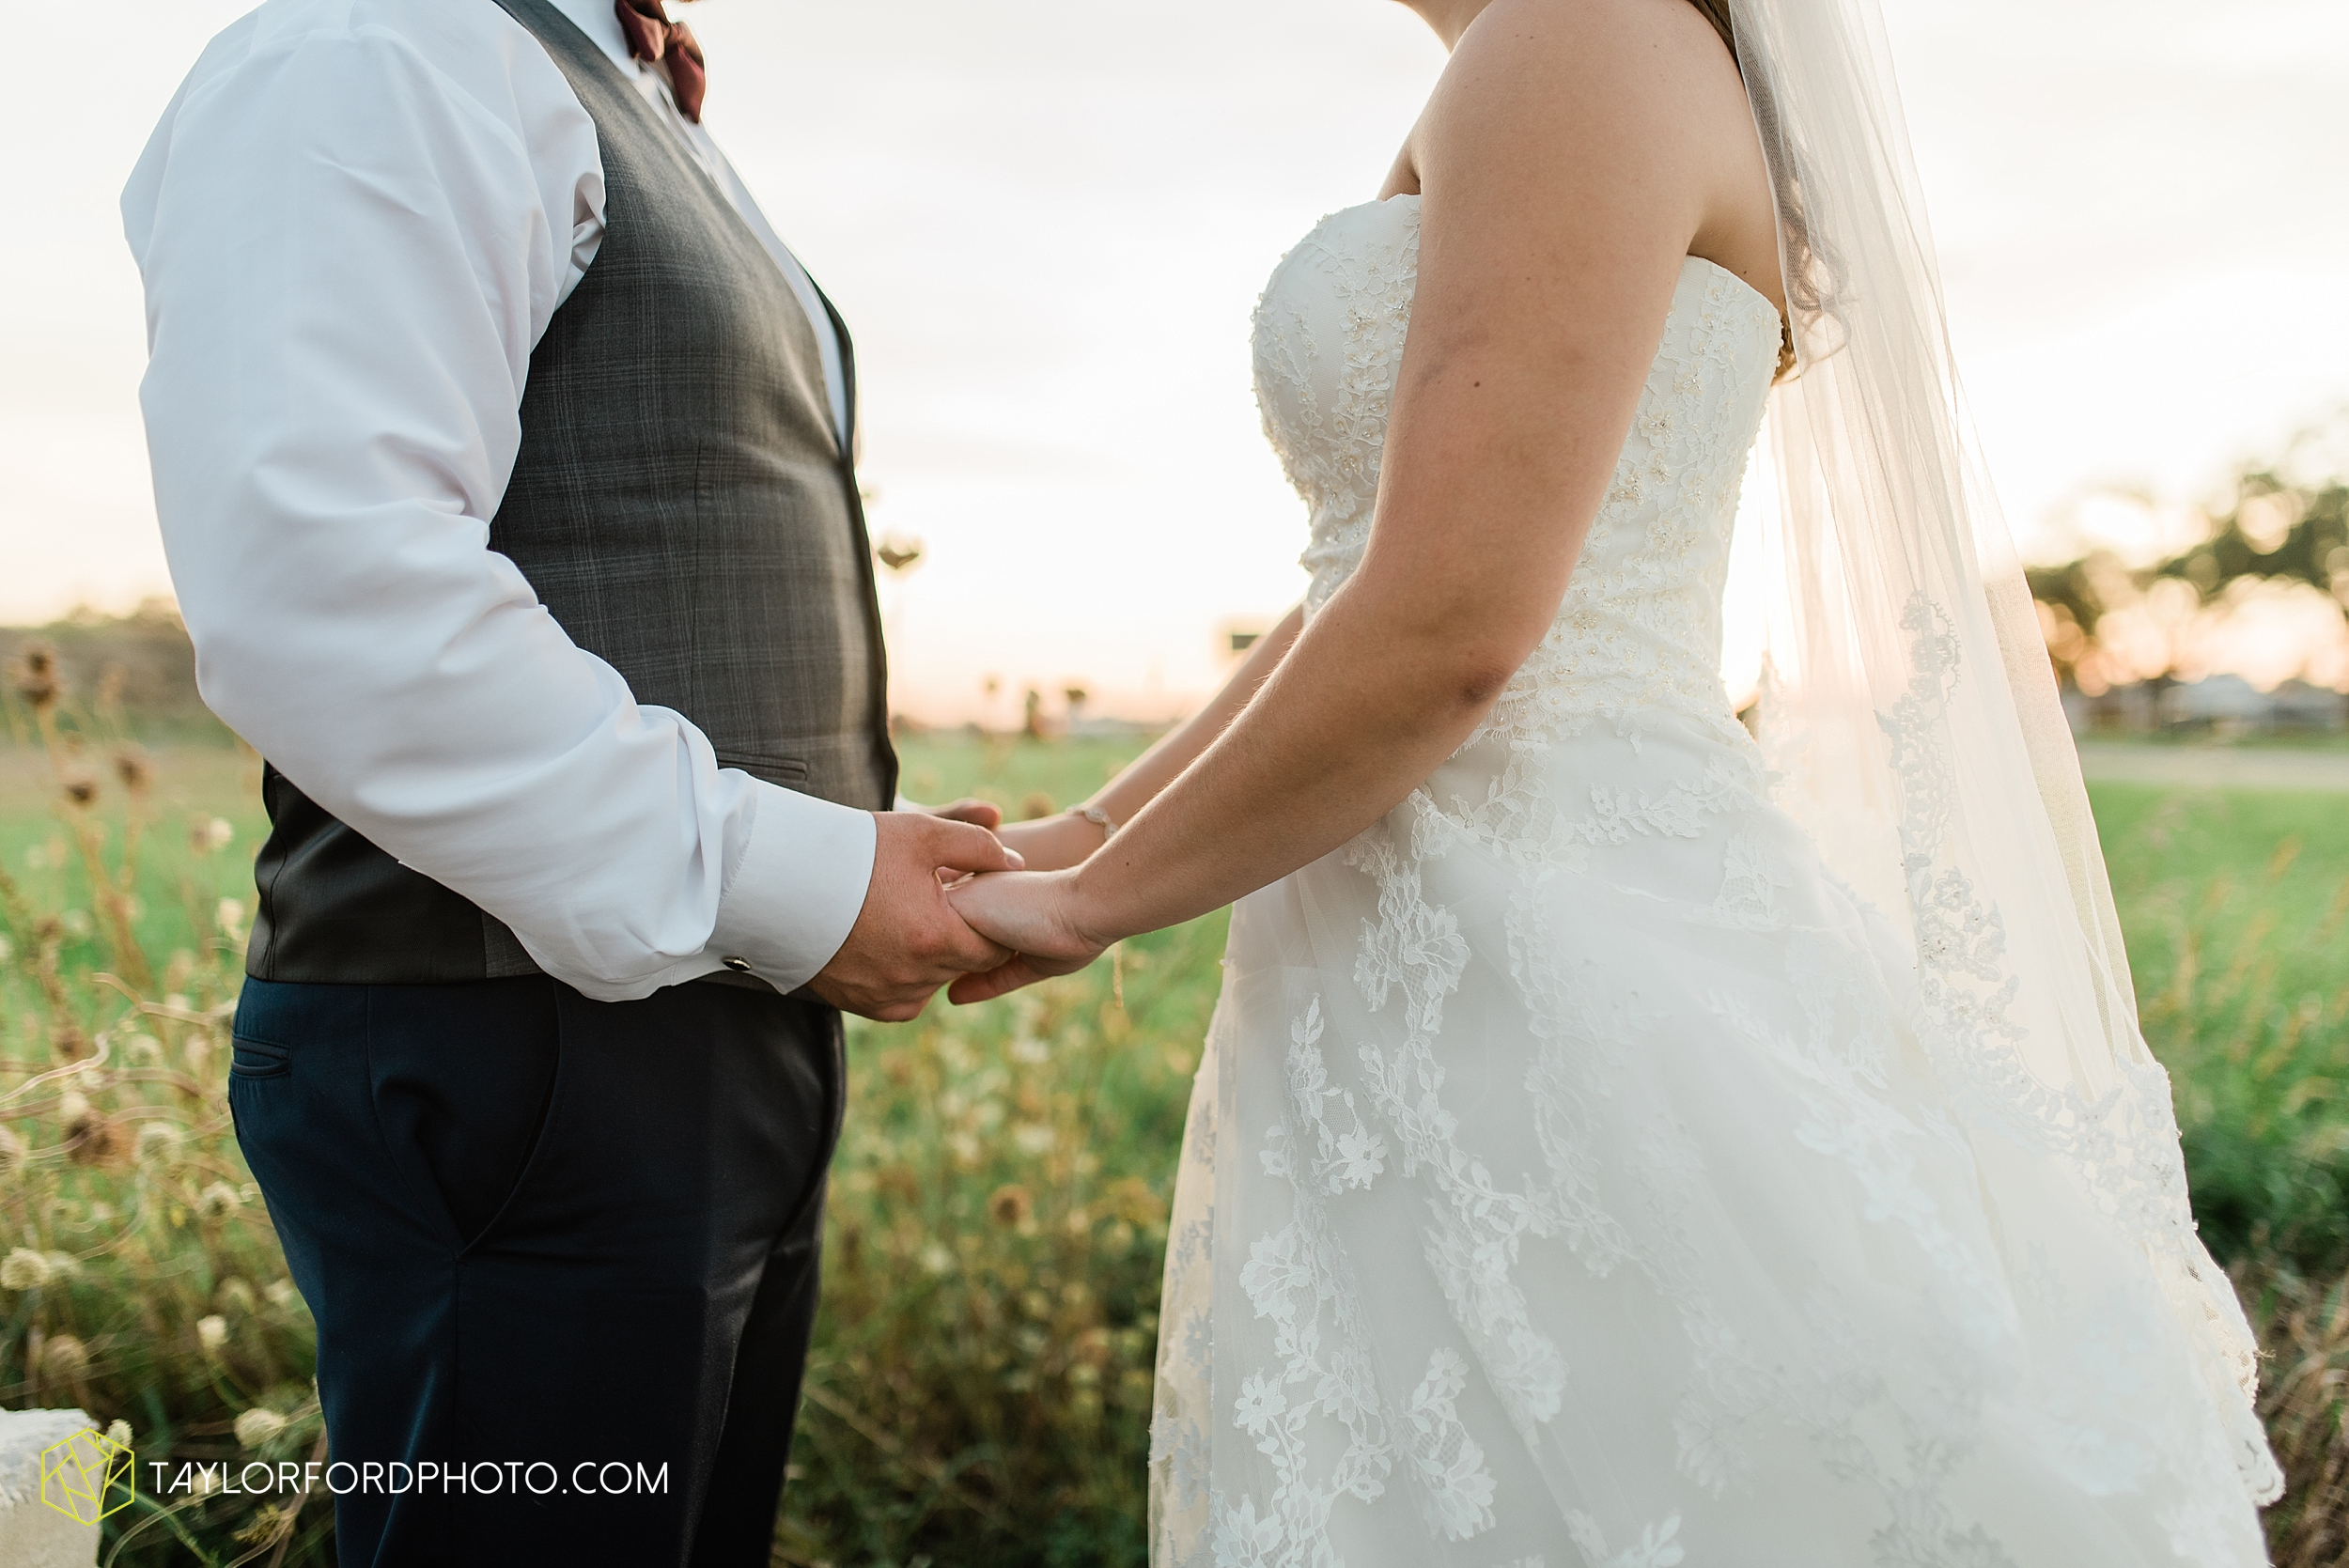 chelsey-zosh-jackson-young-first-united-methodist-church-senior-center-van-wert-ohio-wedding-photographer-taylor-ford-photography_0102.jpg